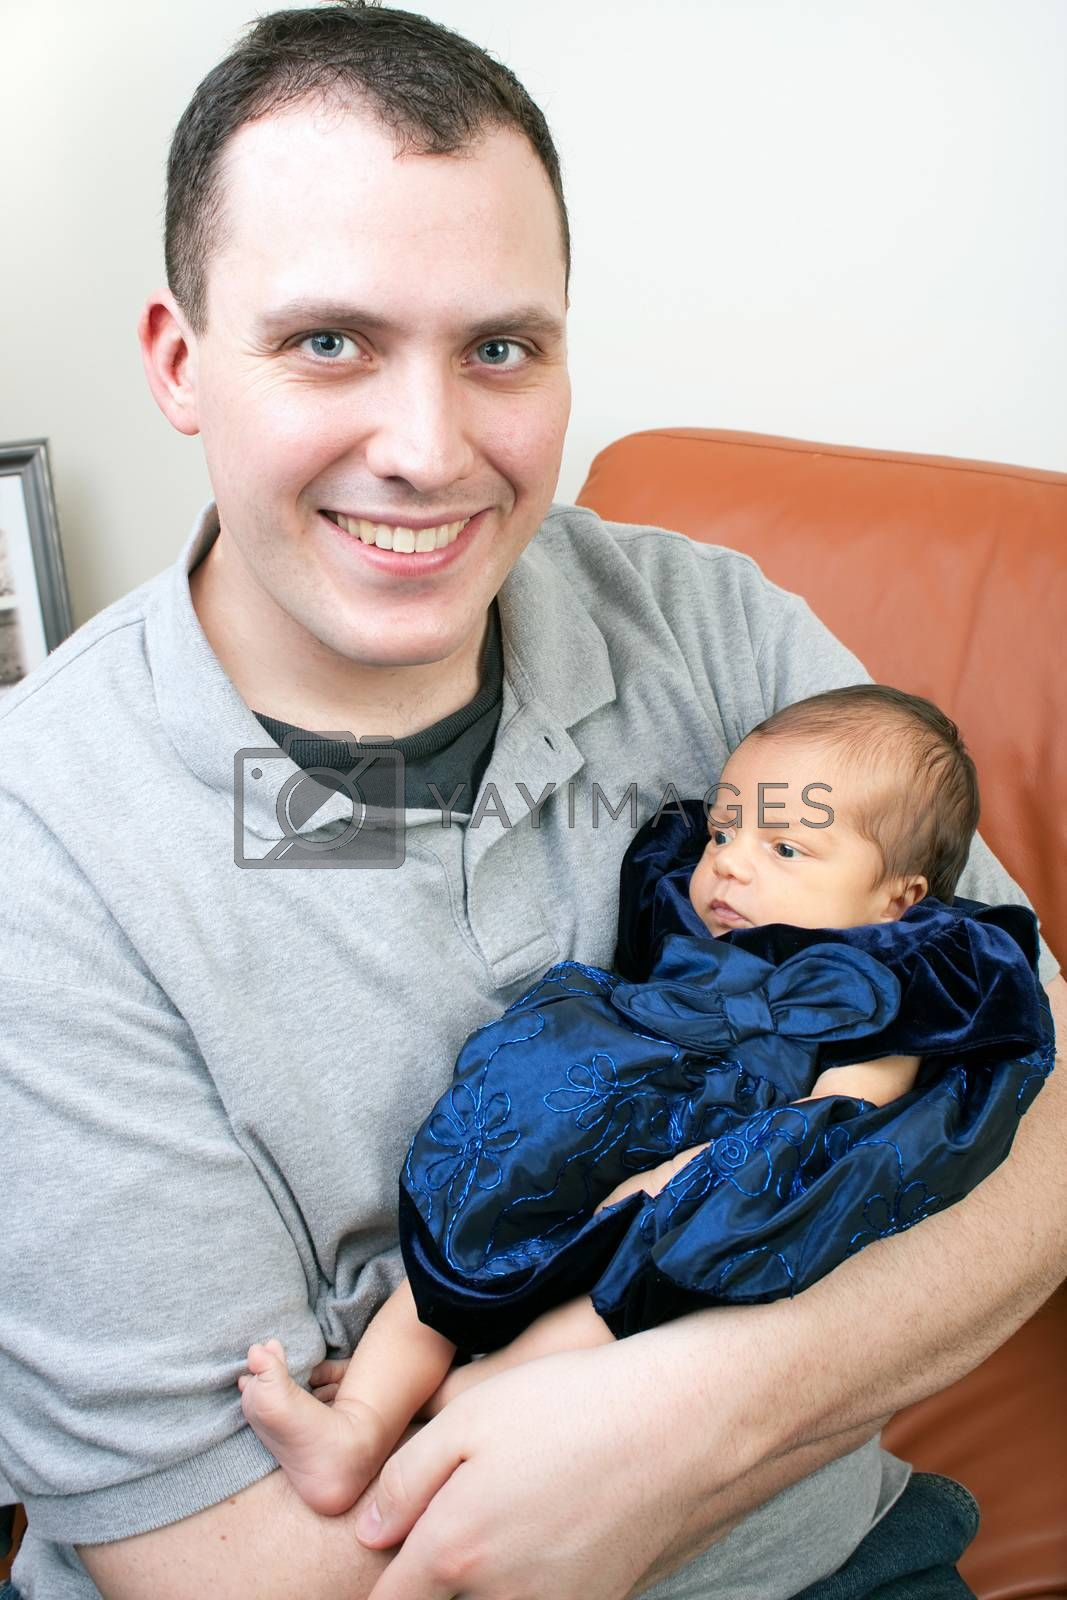 Cute newborn baby girl being held by her dad.